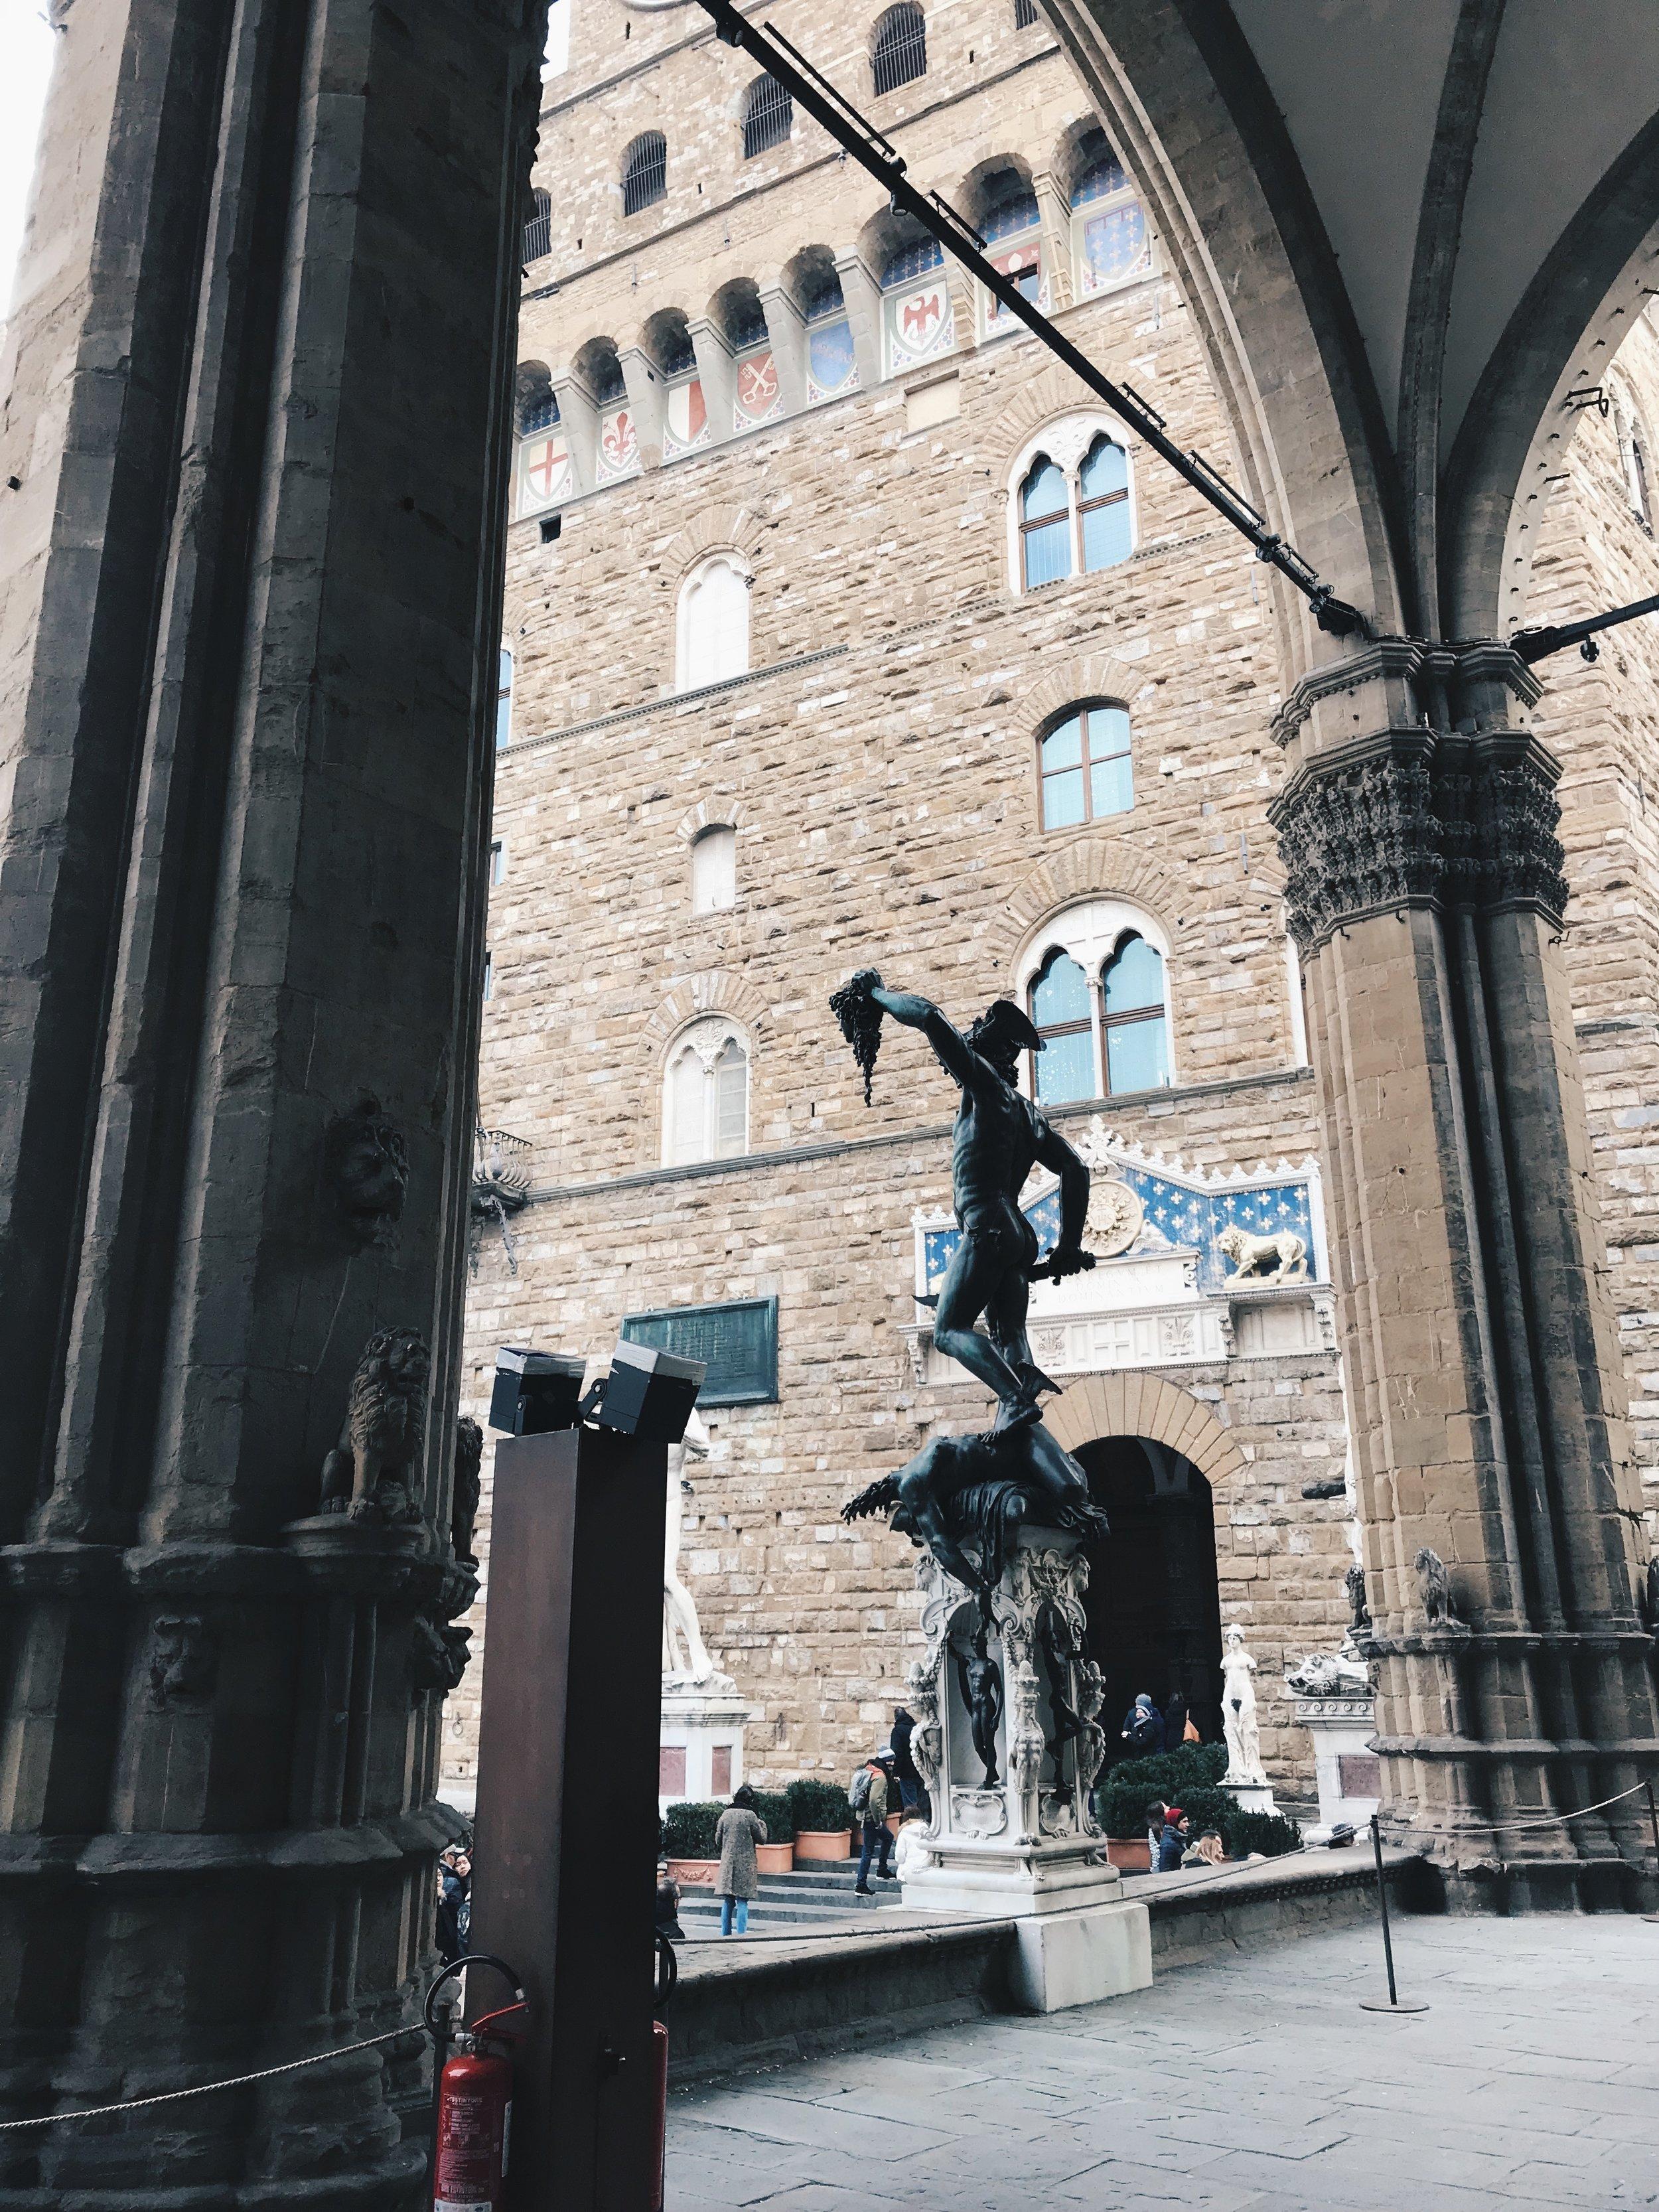 Piazza della Signoria, photographed by Kiely Schuck.